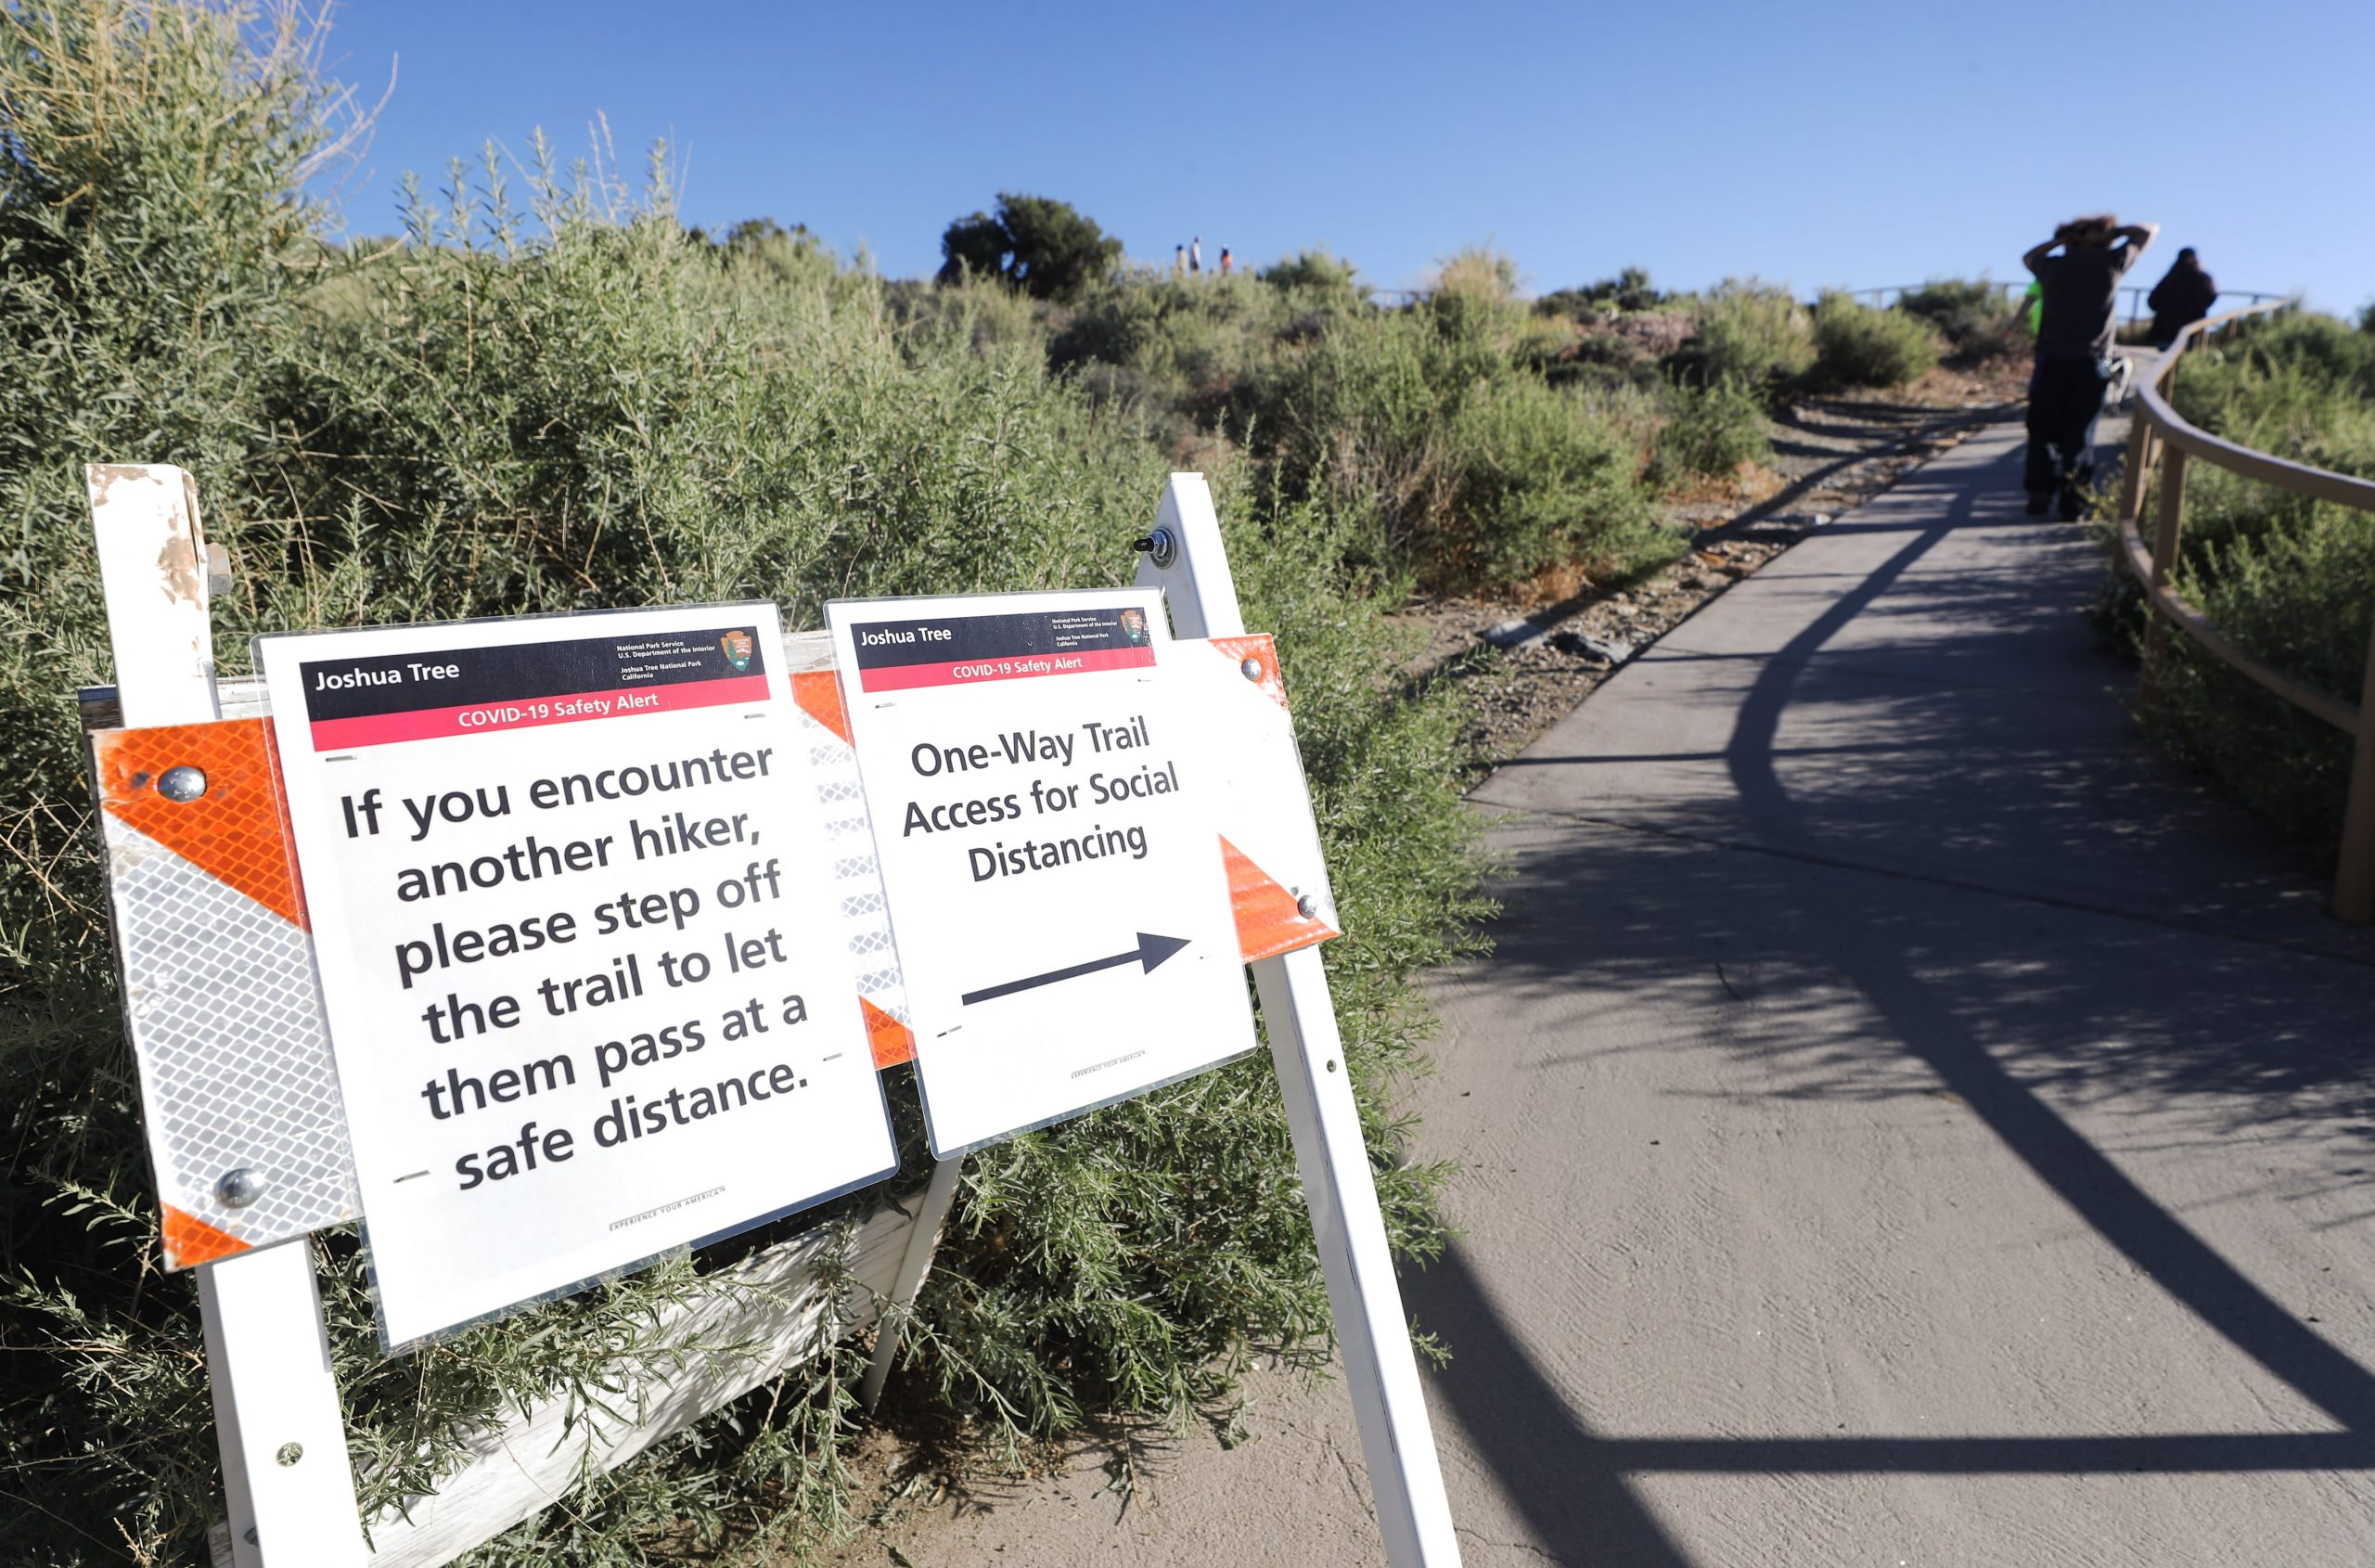 National parks may be next vacation spots